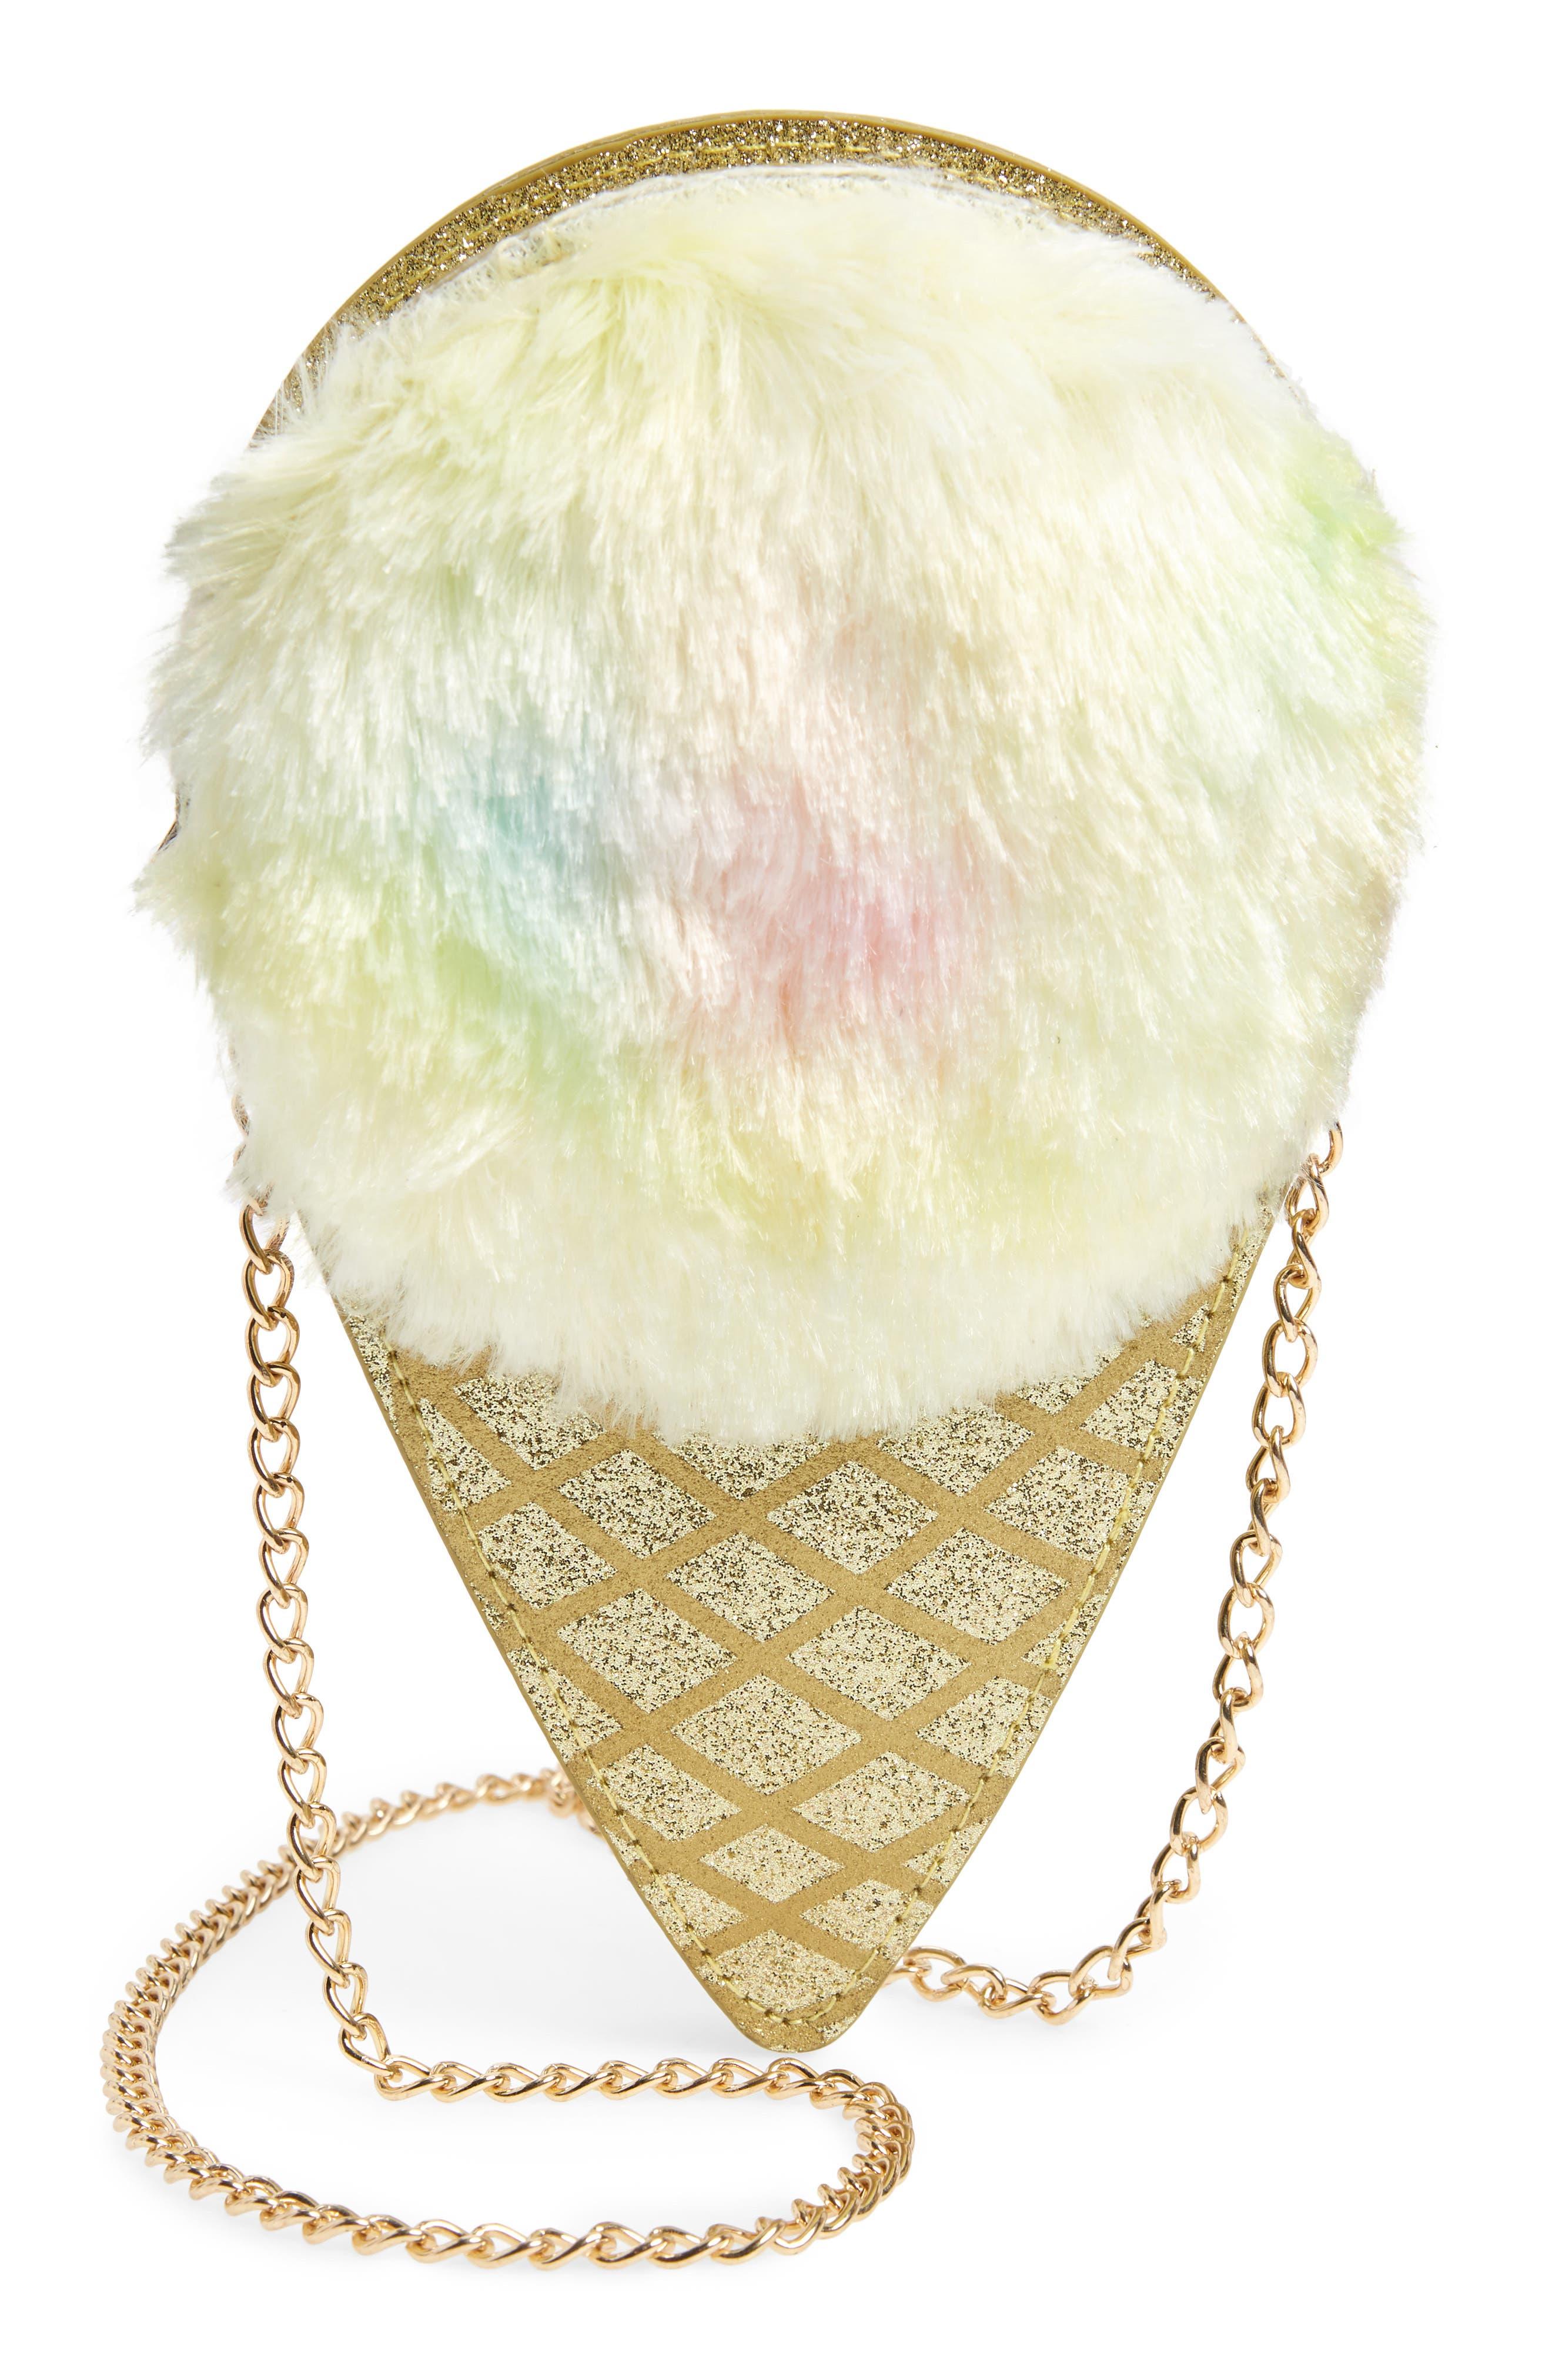 Girls Capelli New York Ice Cream Cone Crossbody Bag